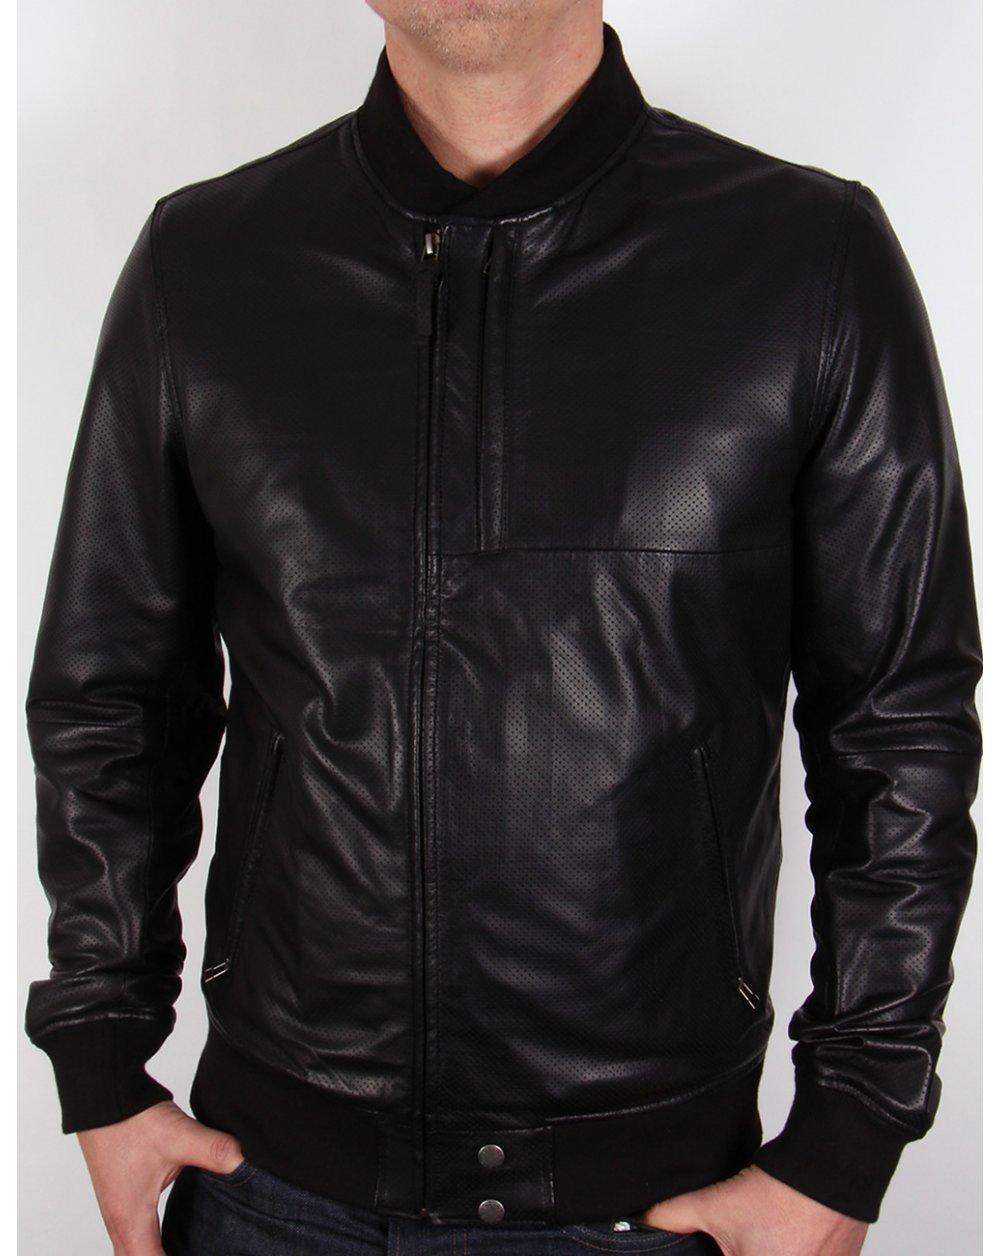 Leather jacket uk mens - Pretty Green Defiance Leather Jacket Black